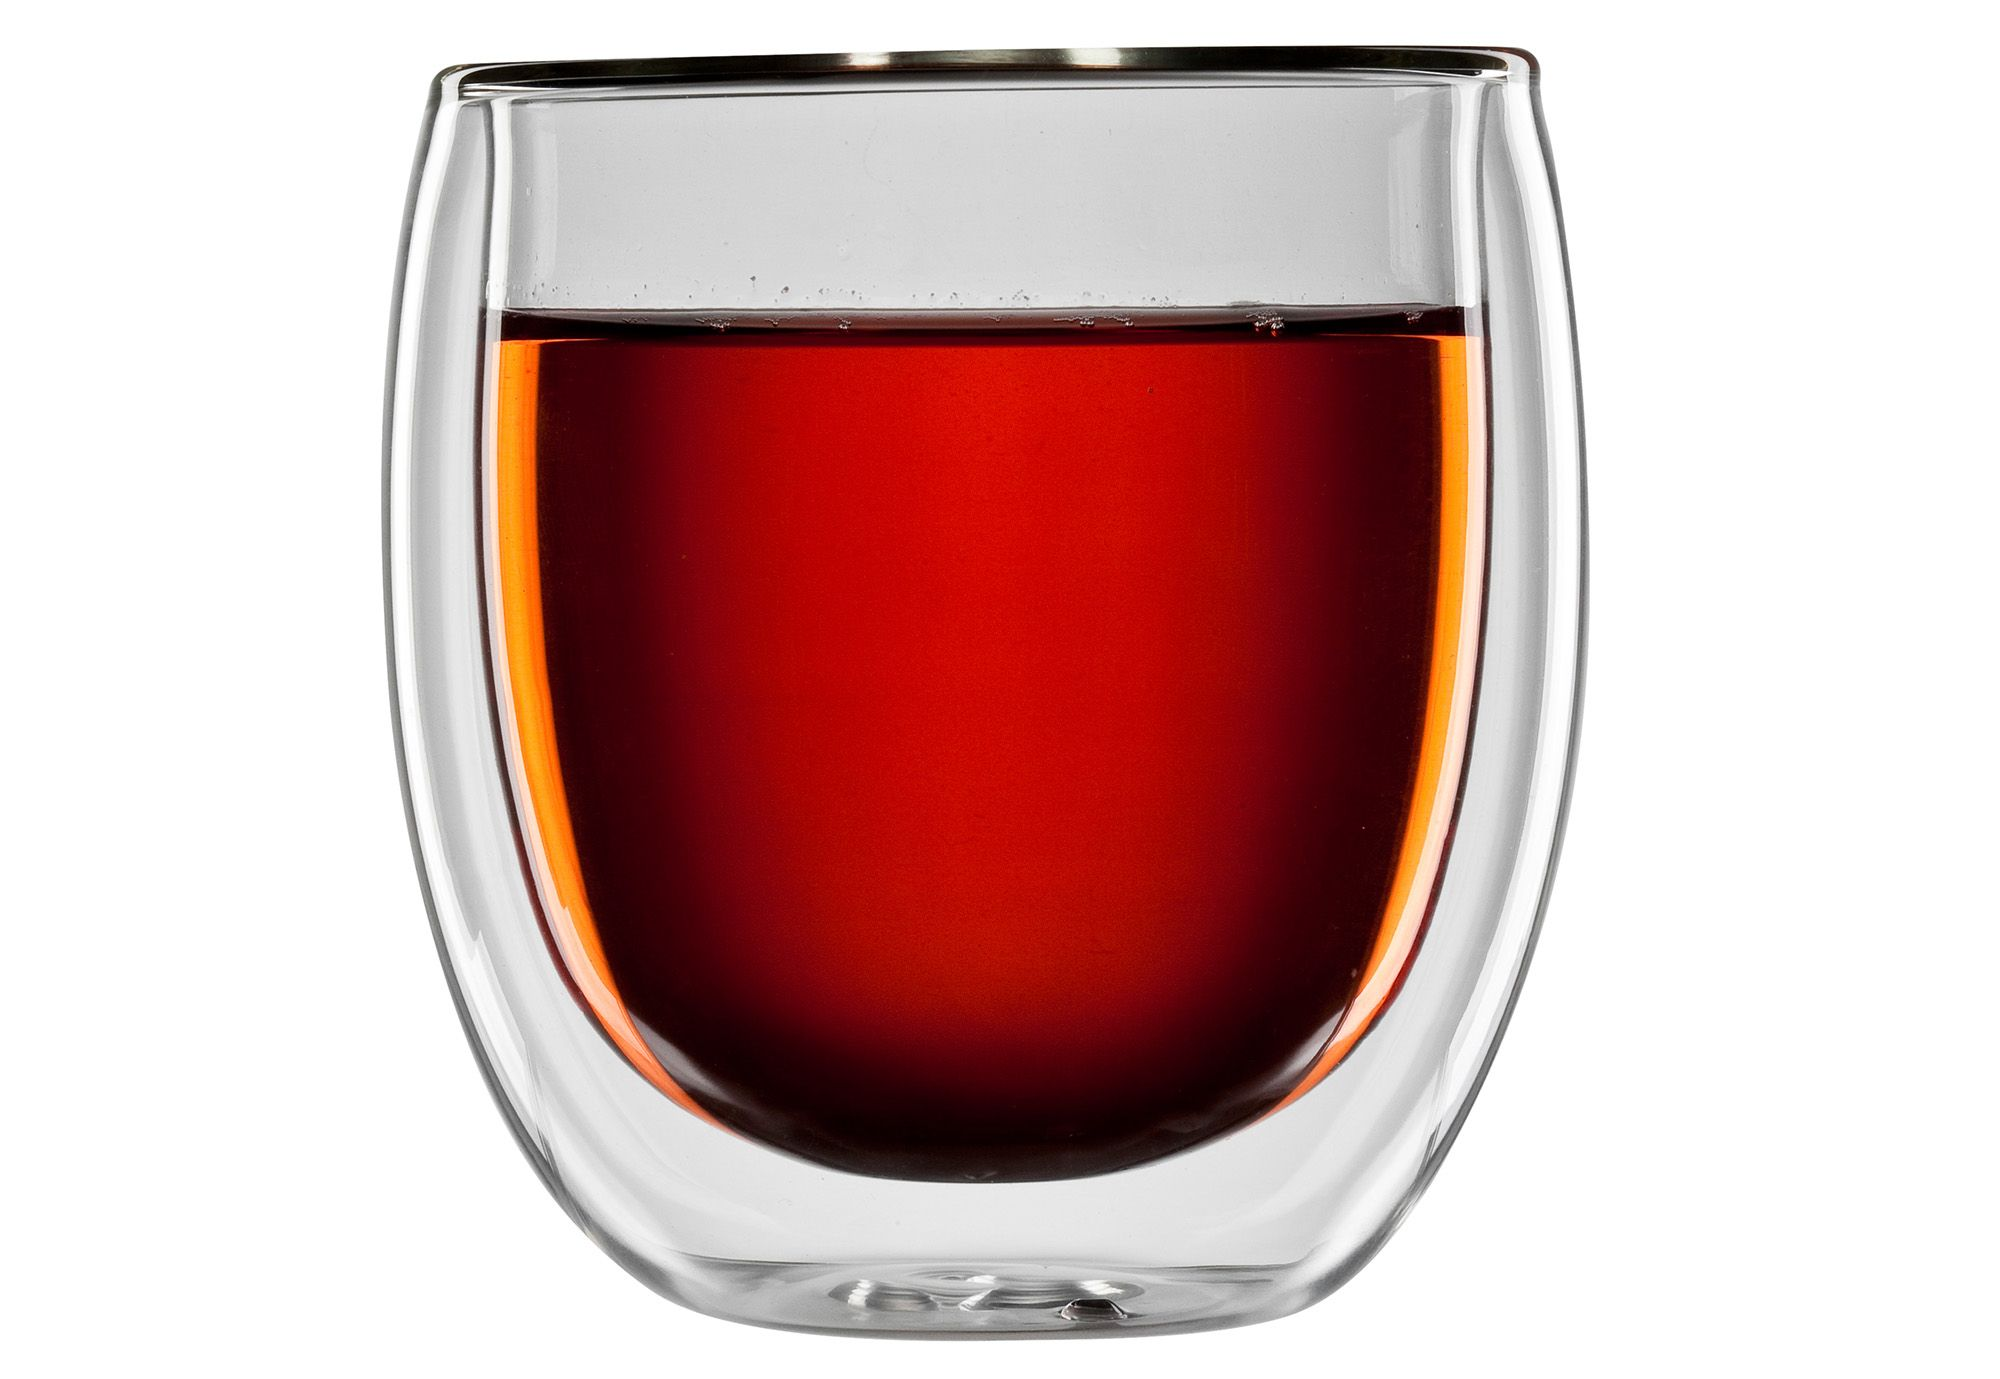 BLOOMIX bloomix Teeglas, 4er Set, »Tanger«, 300 ml